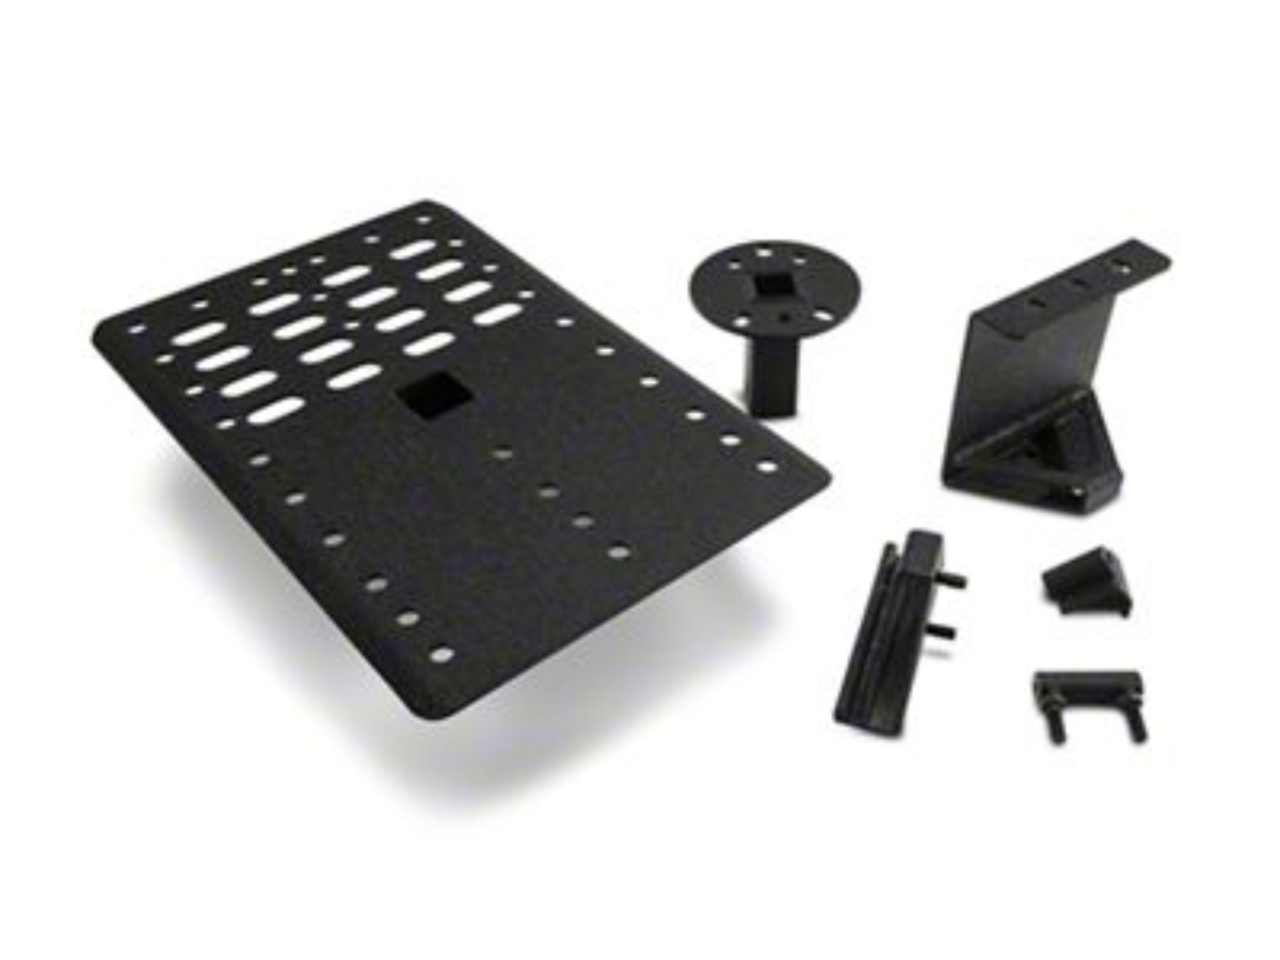 Smittybilt iRack Intelligent Racking System (87-18 Jeep Wrangler YJ, TJ, JK & JL)